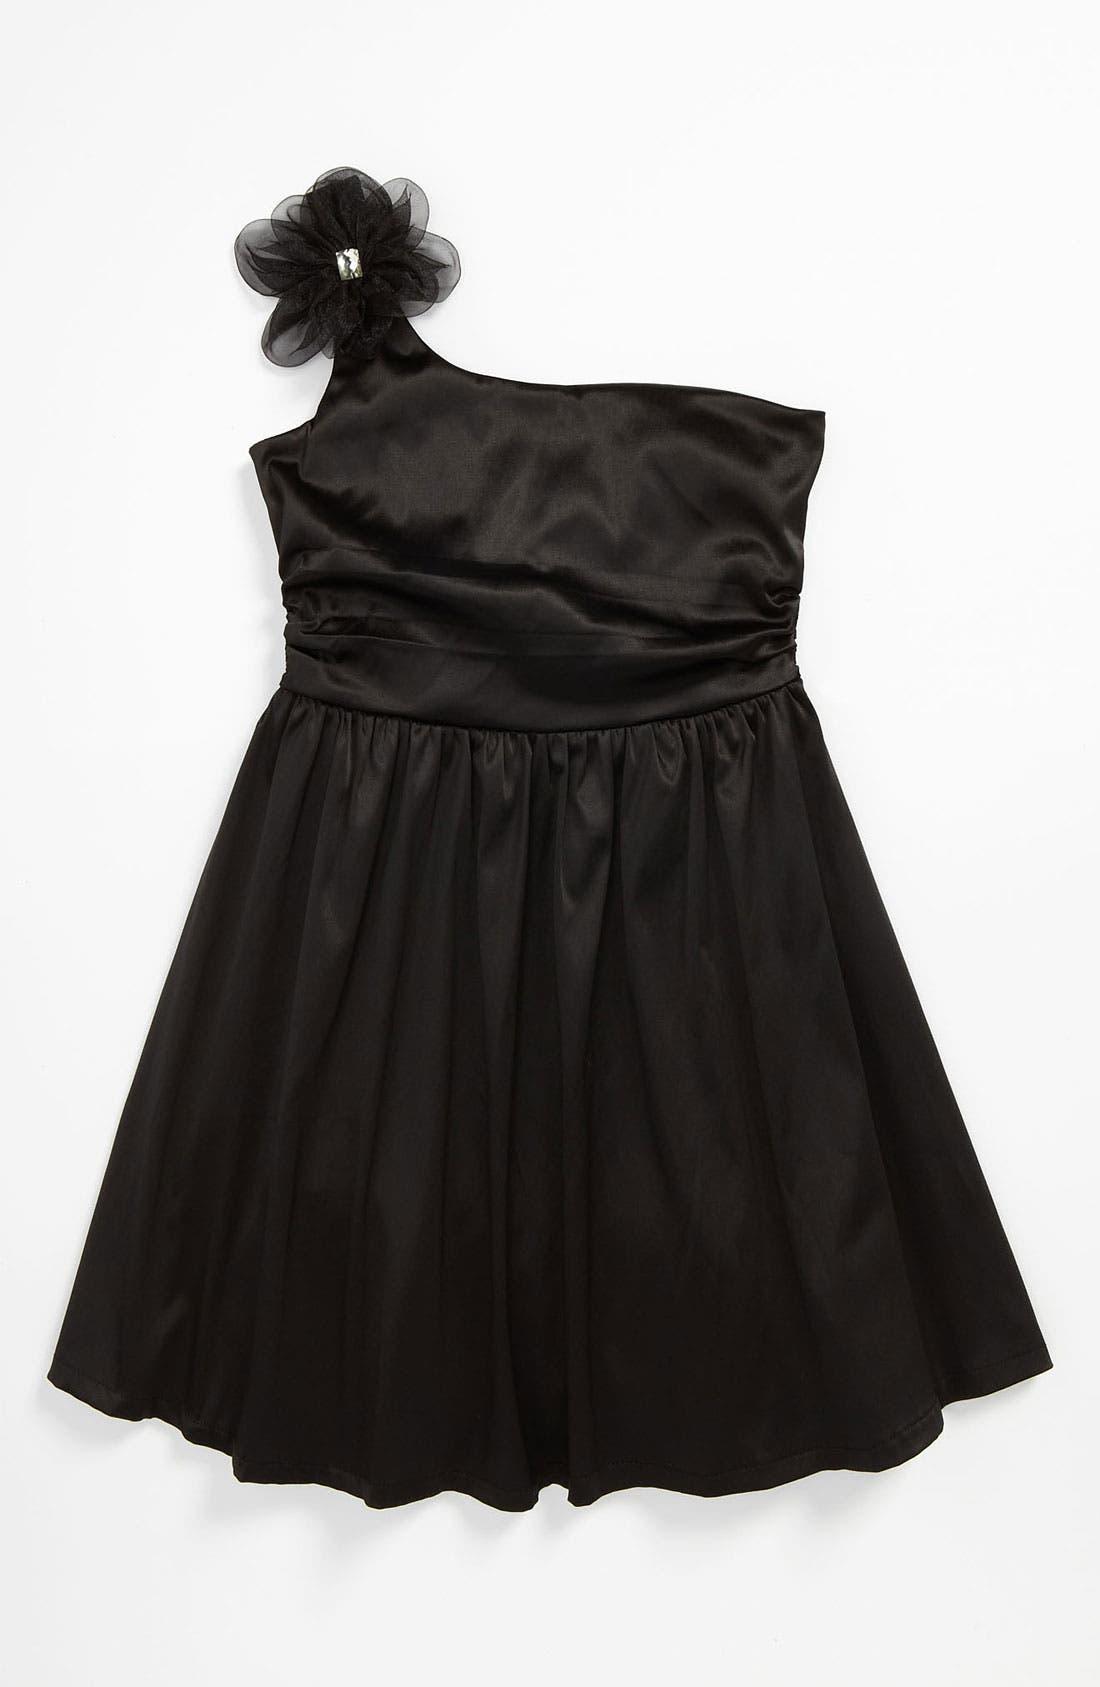 Alternate Image 1 Selected - Ruby Rox One Shoulder Dress (Big Girls)